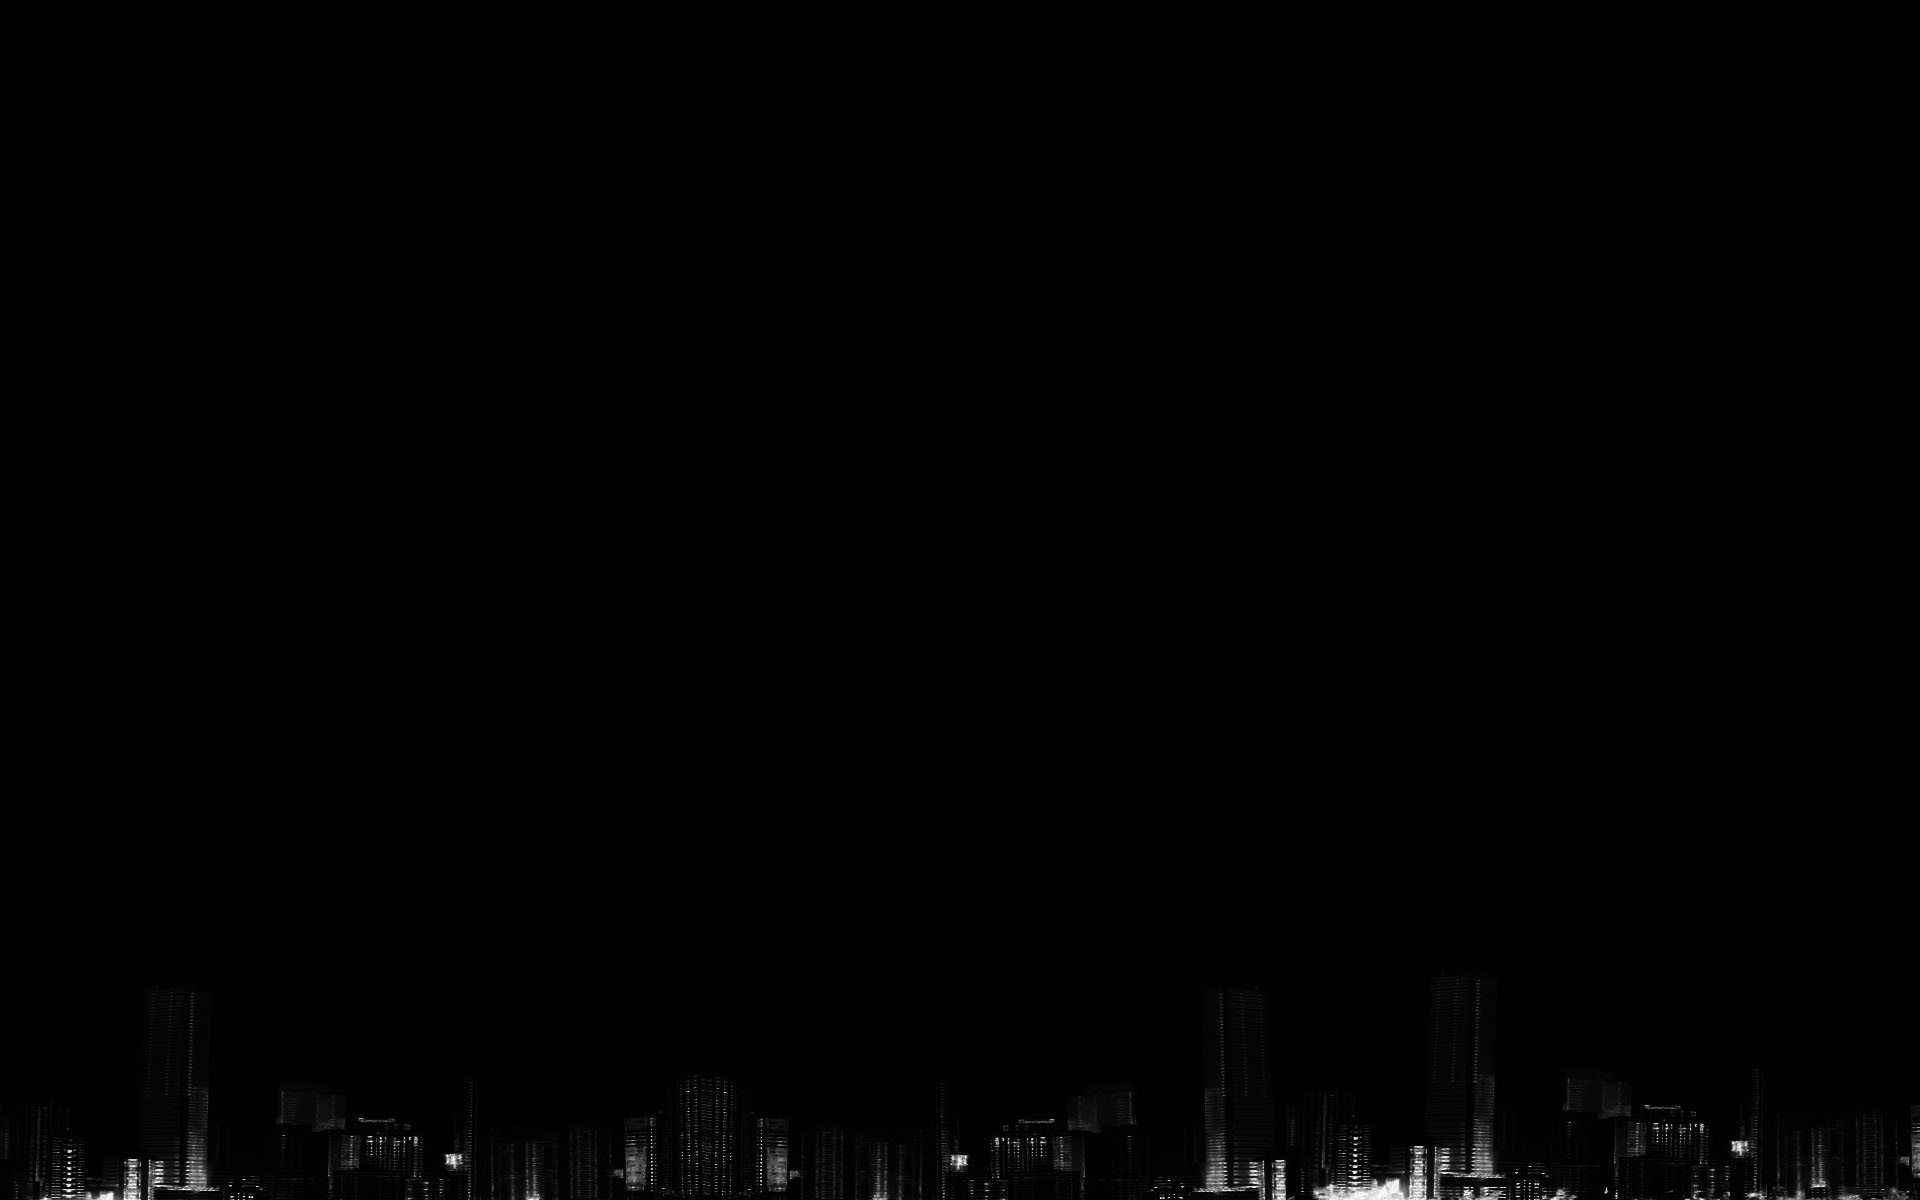 desktop-background-black-HD-Black-Desktop-Backgrounds-afari-throughout-Desktop-Backgro-wallpaper-wpc9004153